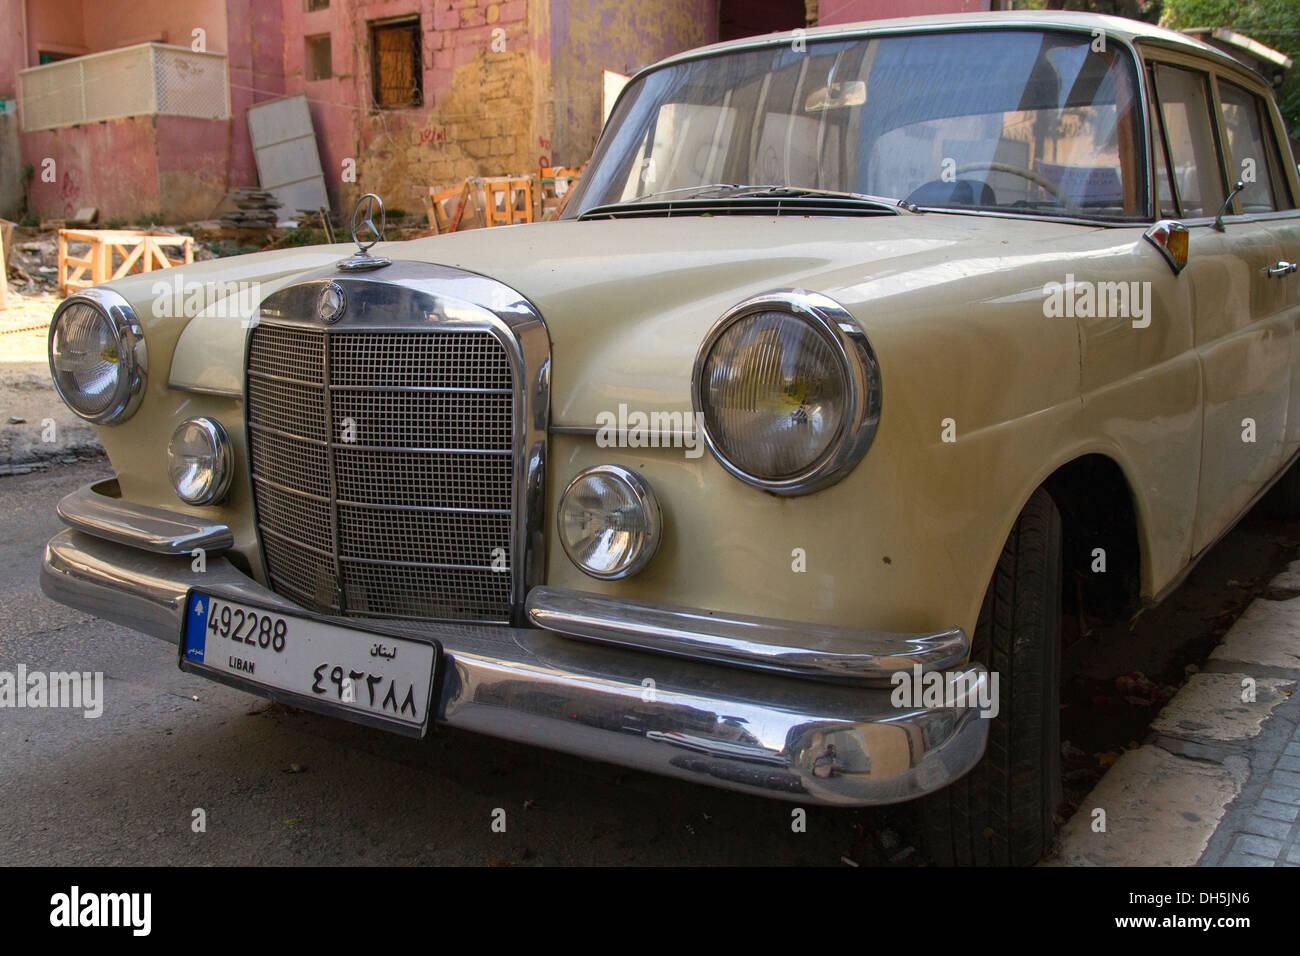 Mercedes Cars For Sale In Lebanon